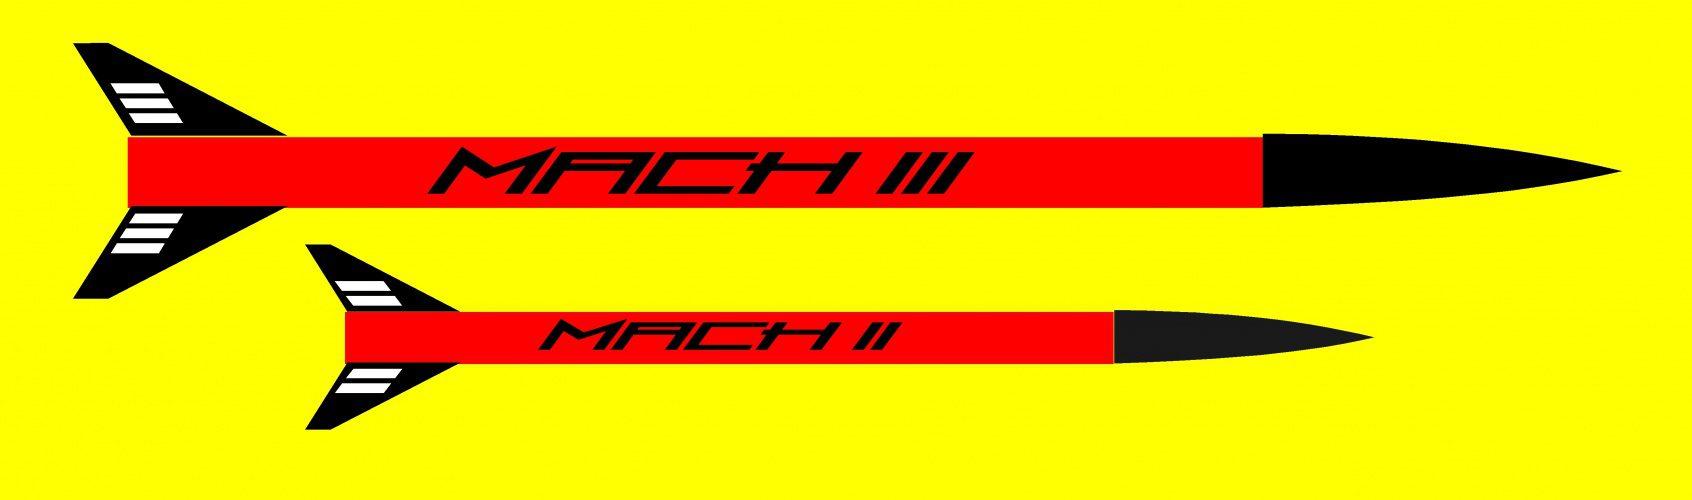 Wildman The Punisher - STICKERSHOCK23.COM